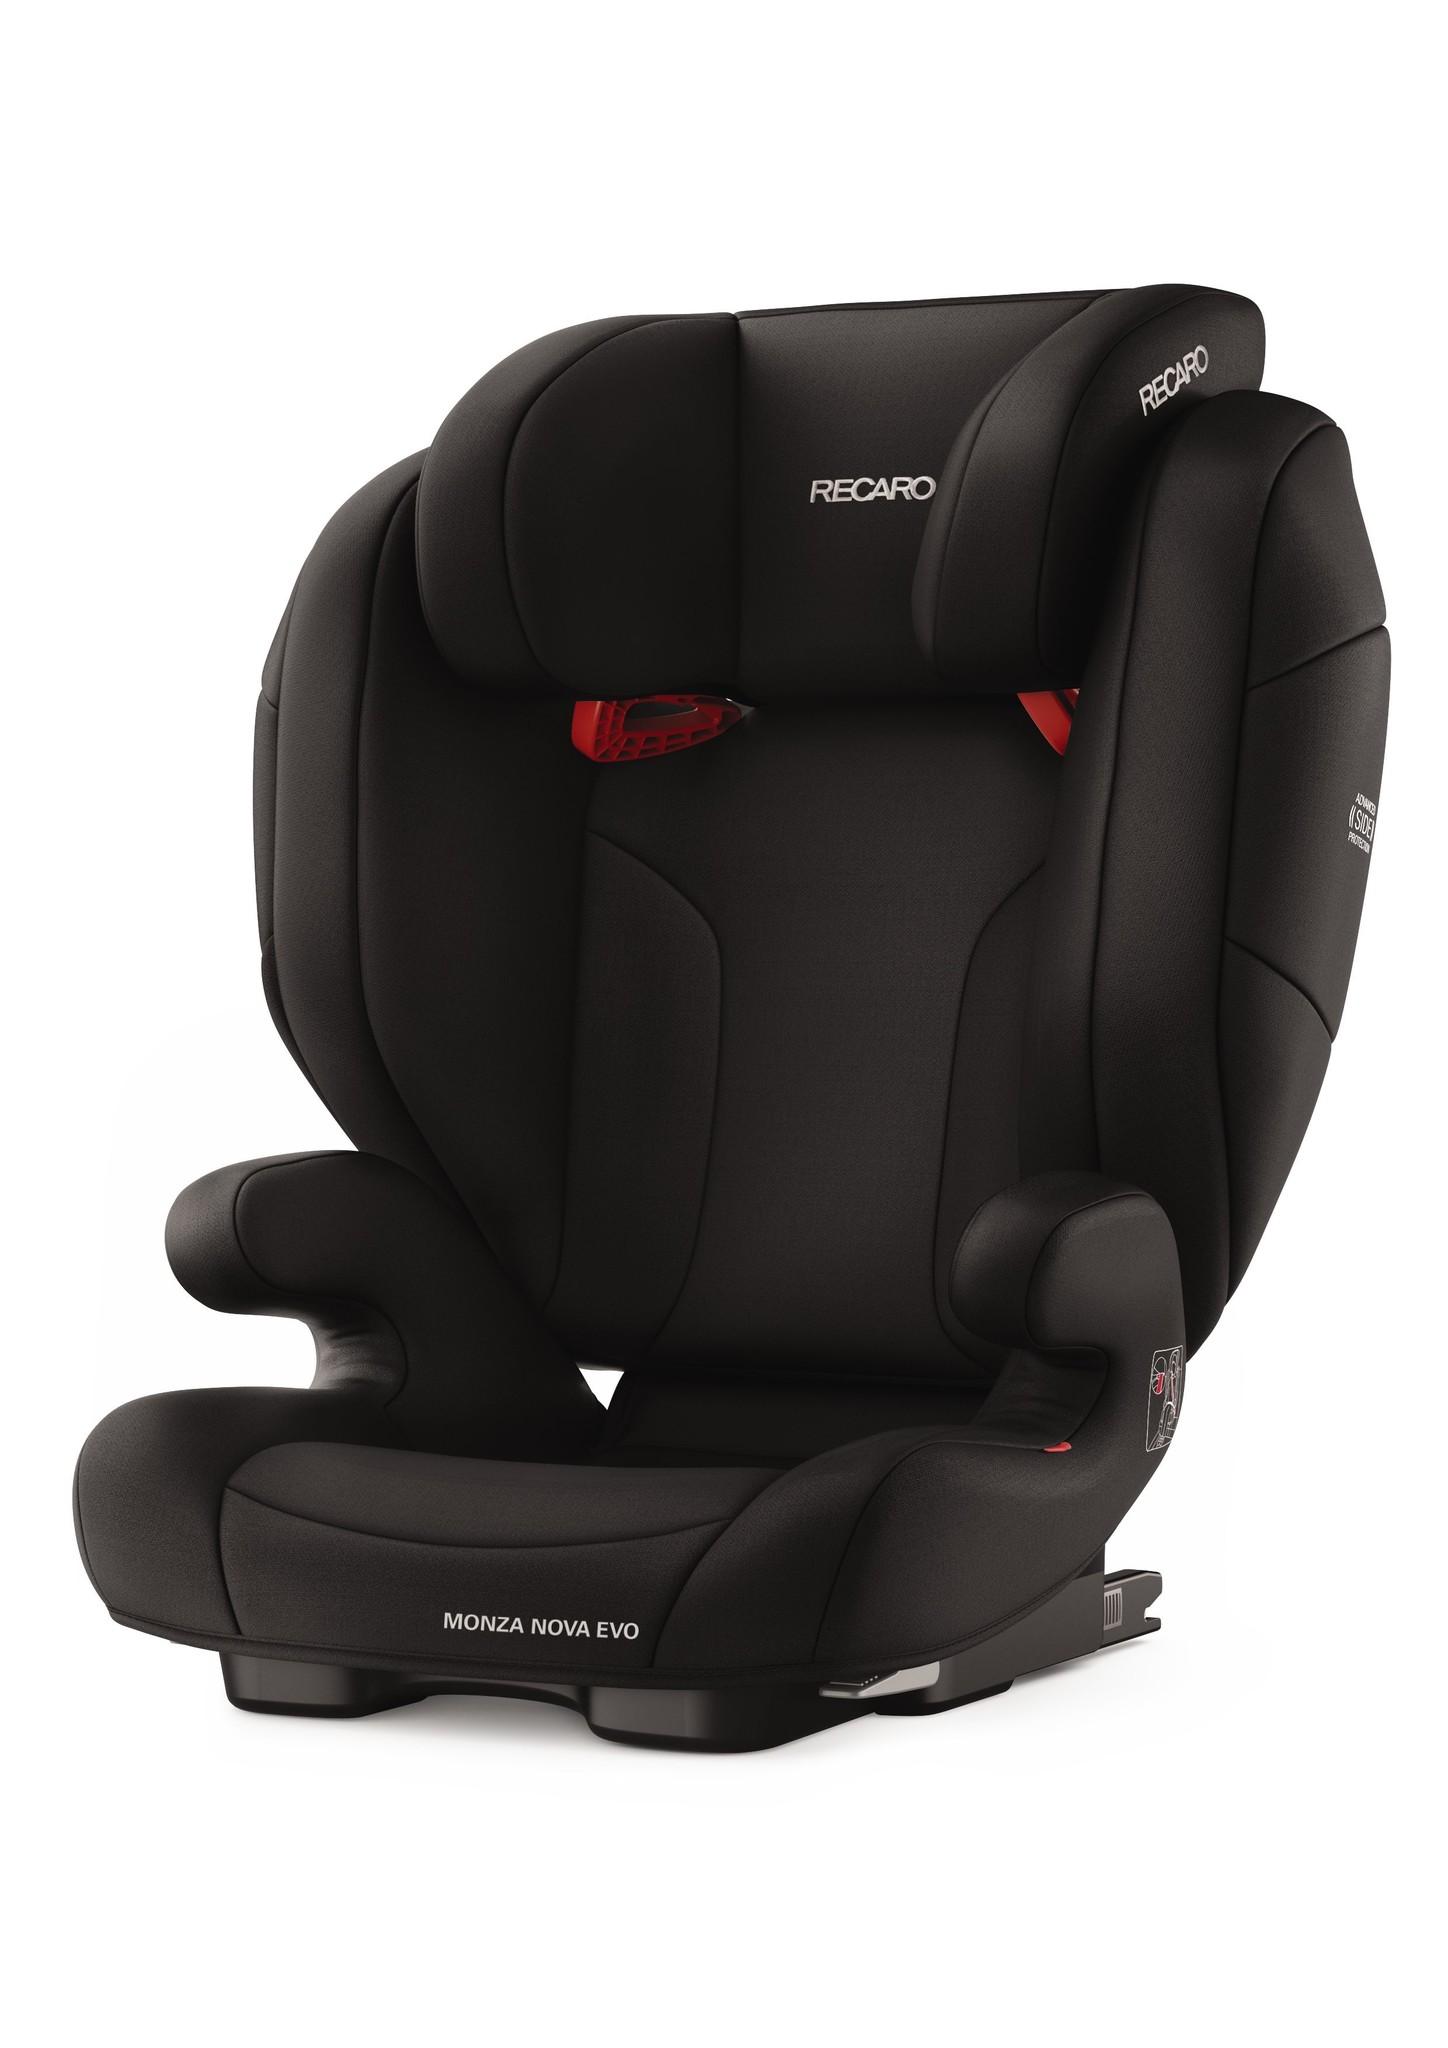 Recaro RECARO Monza Nova EVO Seatfix - Performance Black